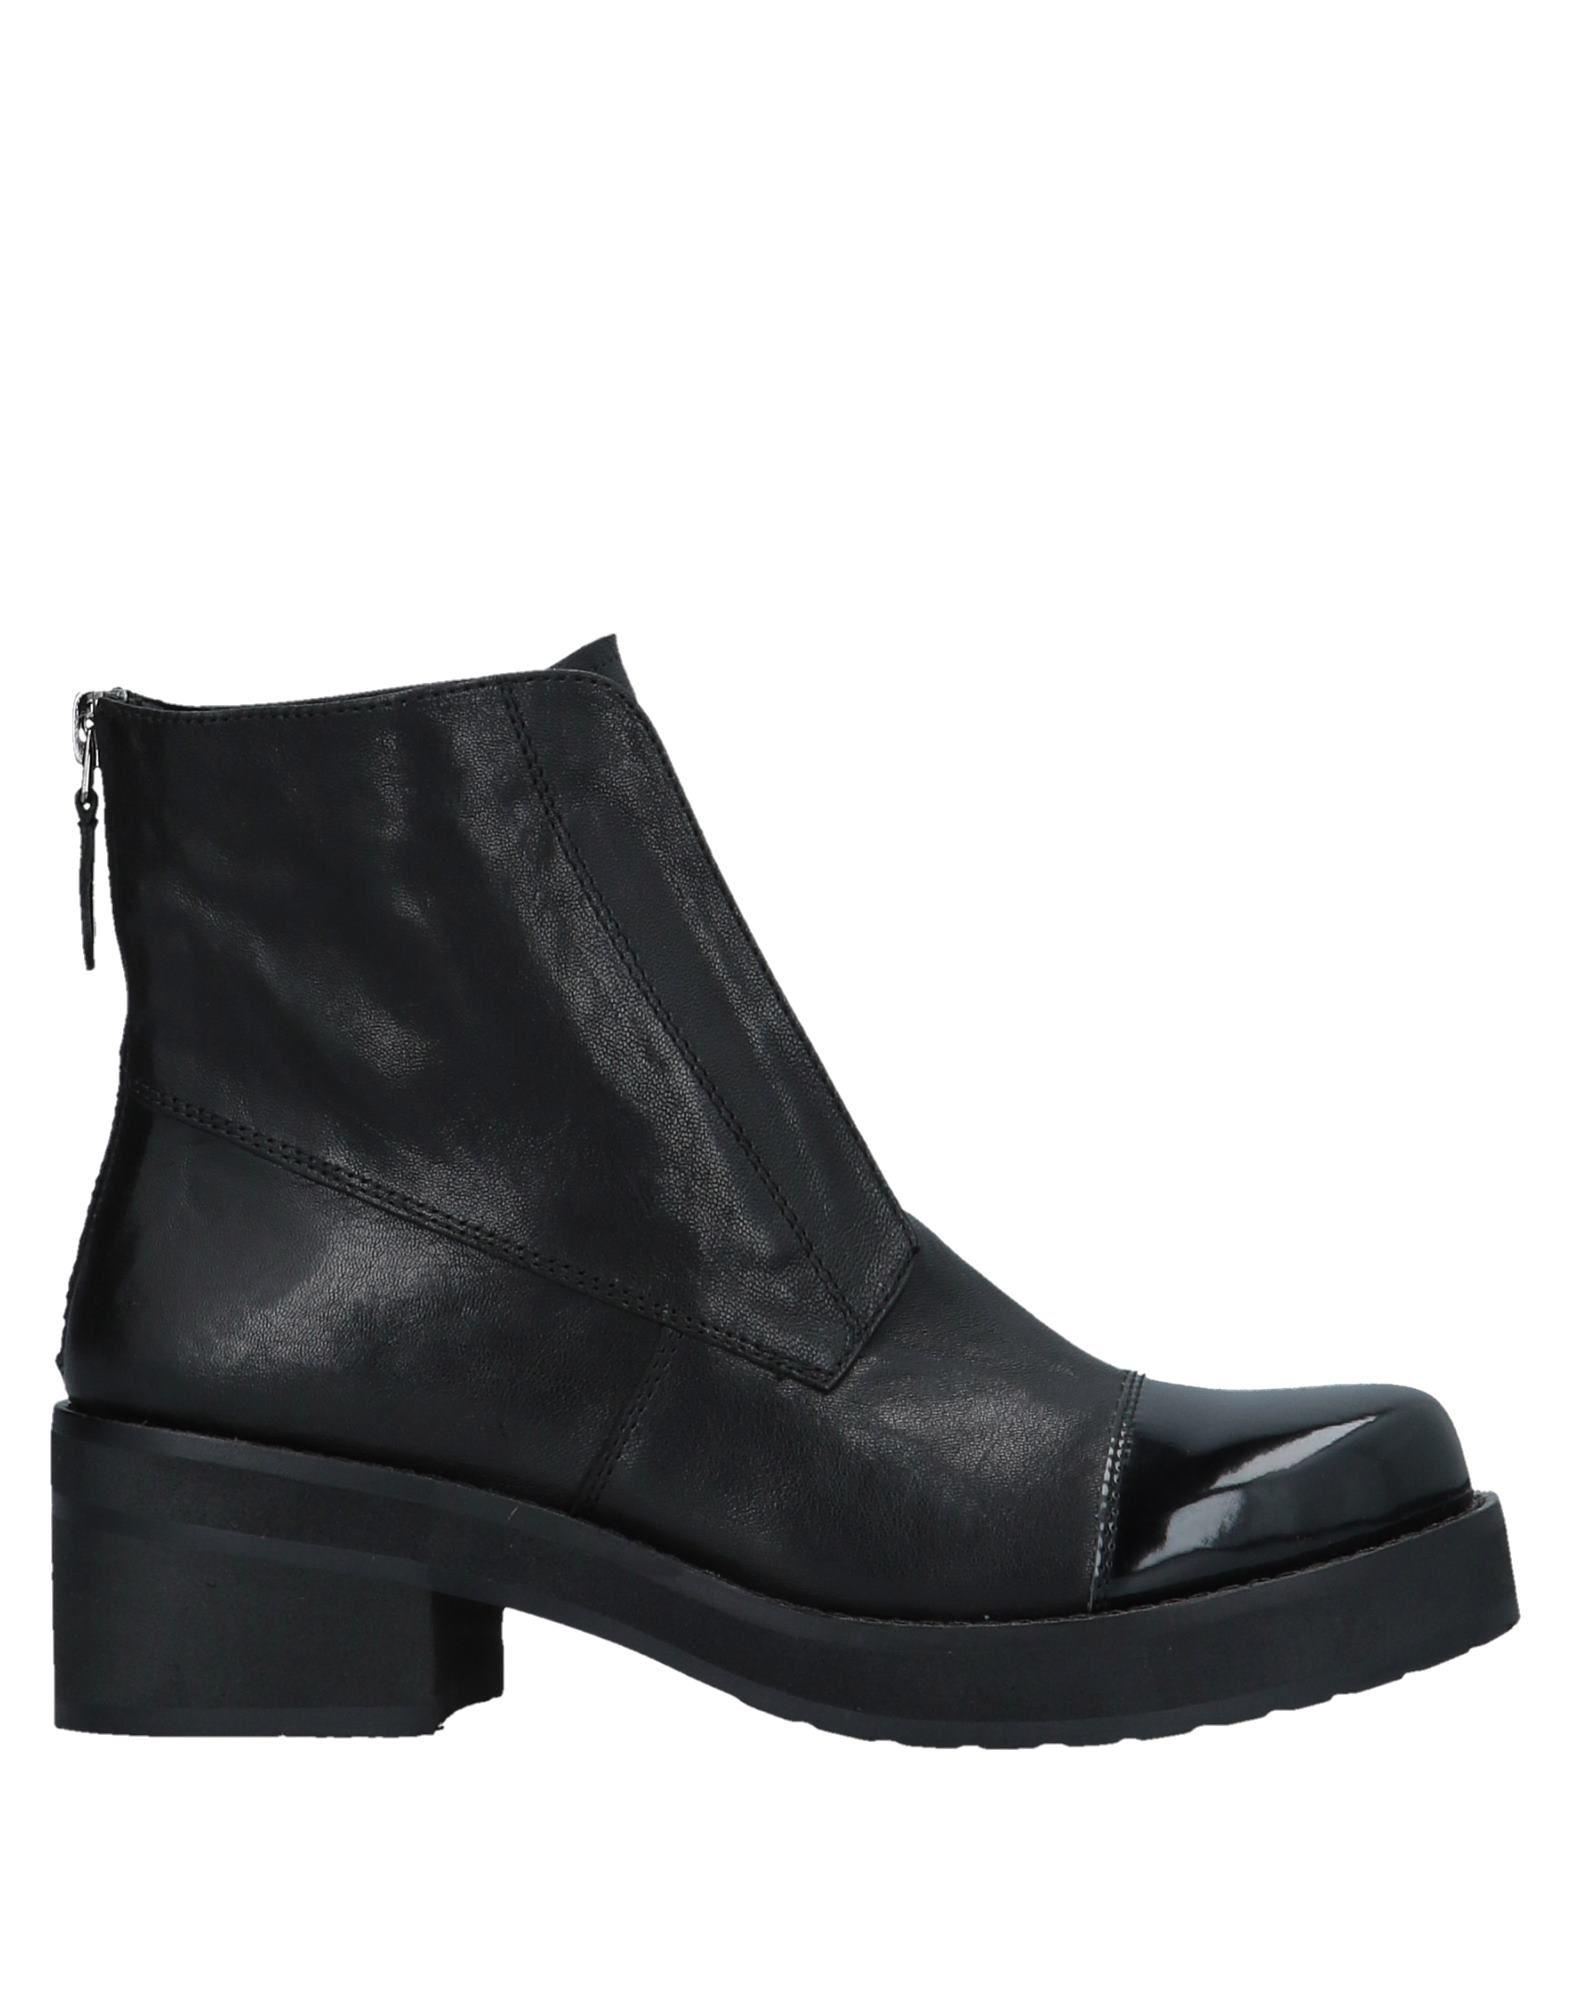 Luciano Barachini Stiefelette Damen  11538161UD Gute Qualität beliebte Schuhe